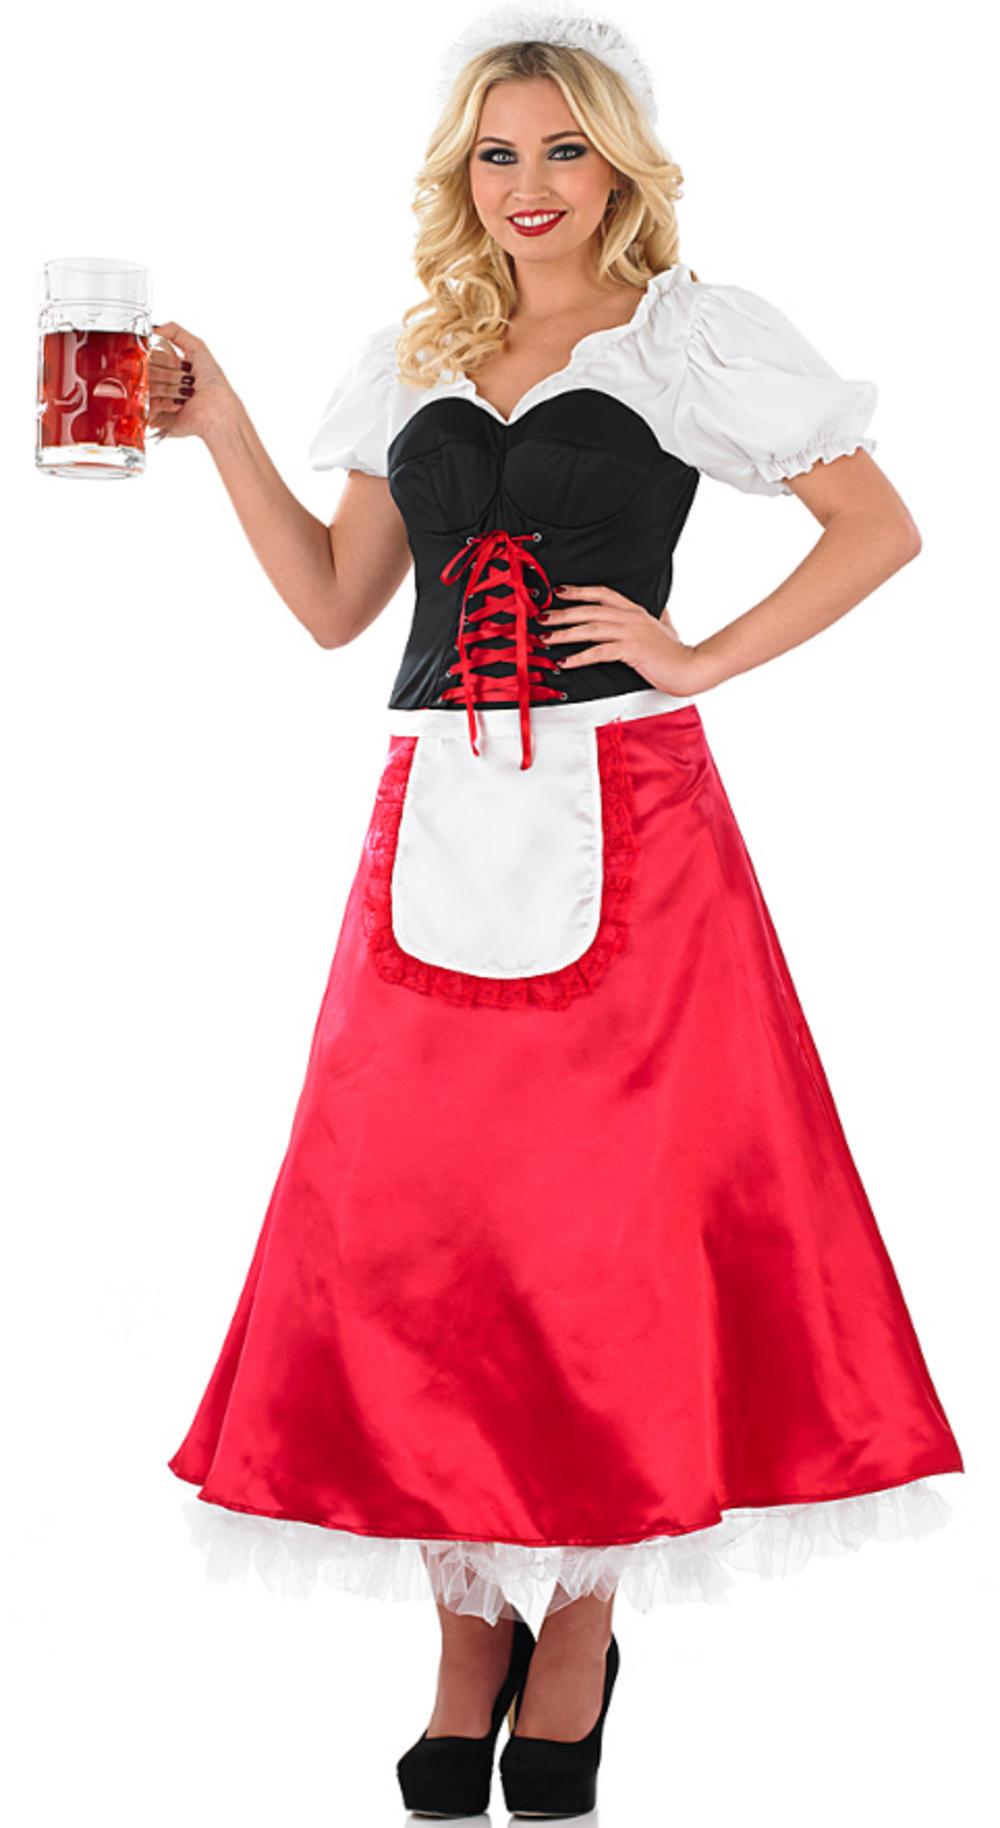 Bavarian Lady Fancy Dress Costume